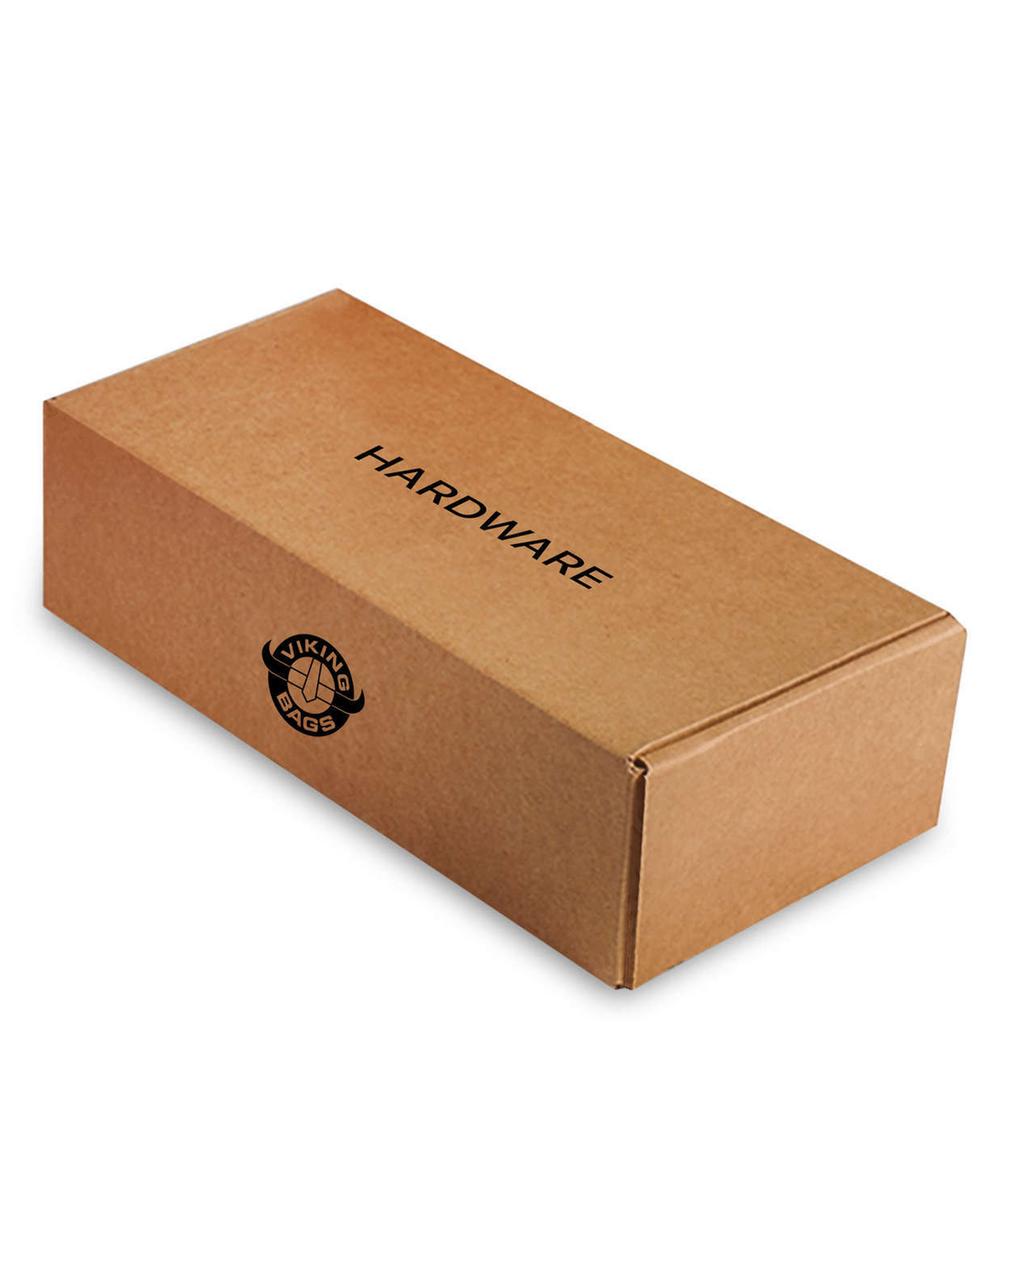 Kawasaki Eliminator 125, BN125 Viking Lamellar Leather Covered Shock Cutout Hard Saddlebag Hardware Box